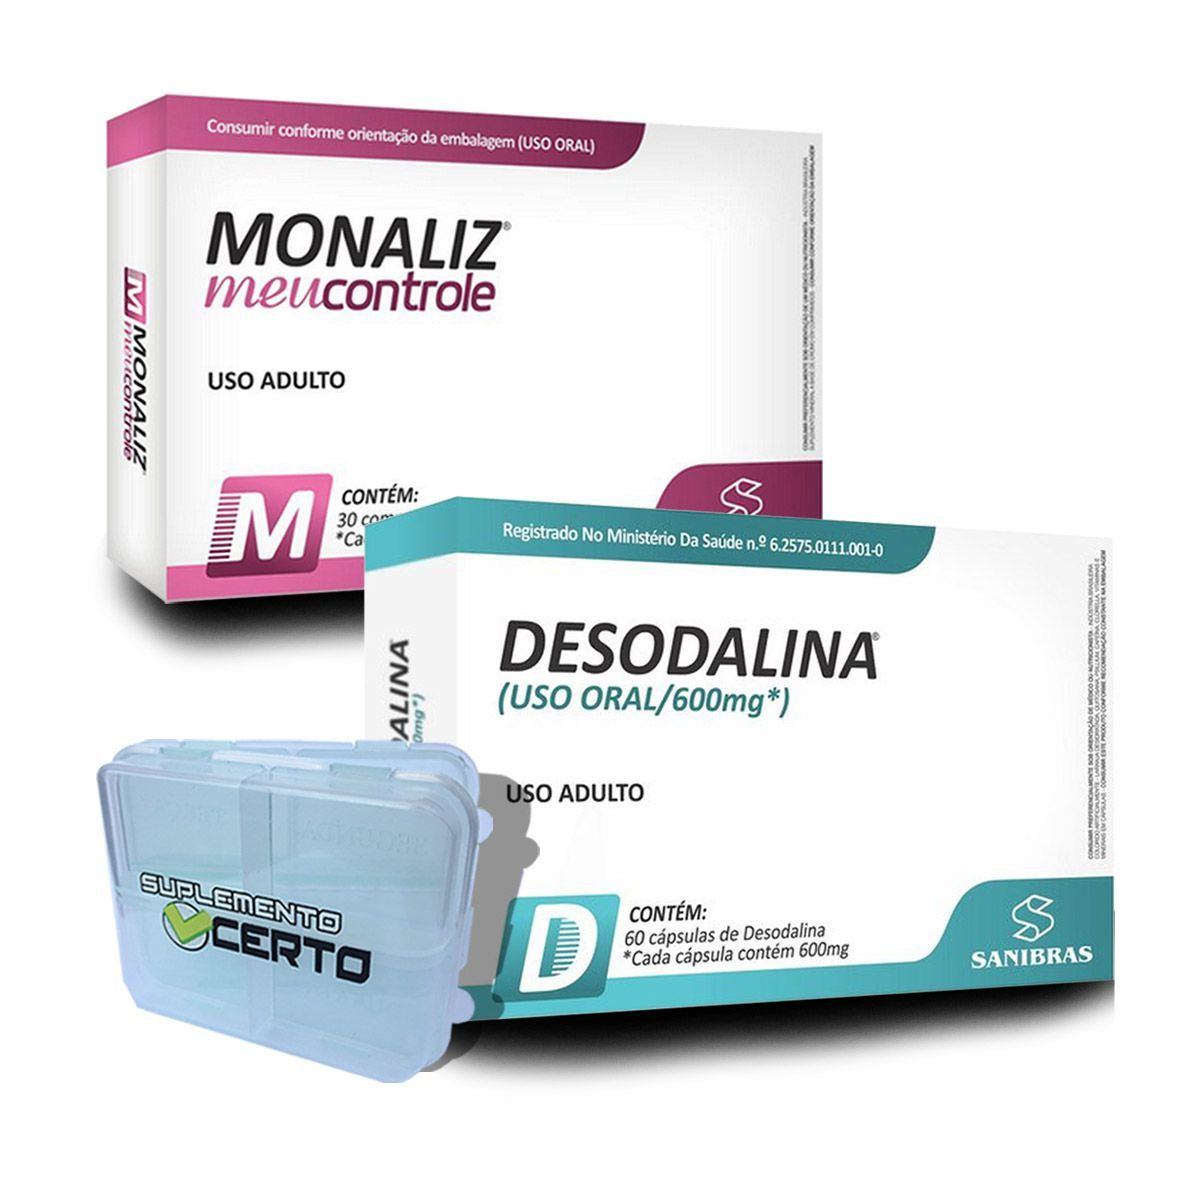 Kit Emagrecimento Desodalina 60 Cápsulas + Monaliz 30 Comprimidos - Sanibras